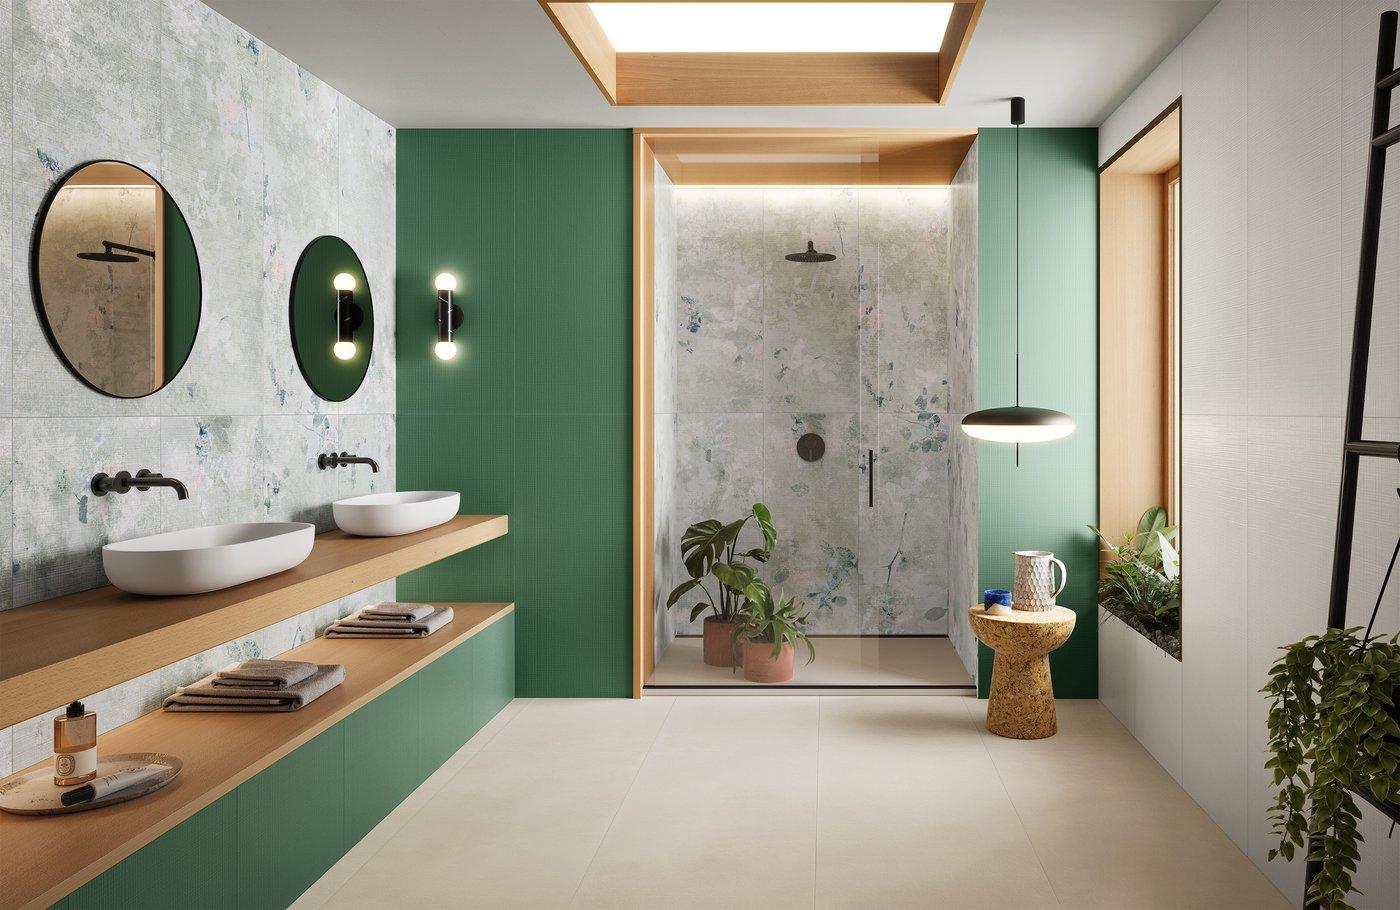 Zelená v kúpeľni - Obrázok č. 1